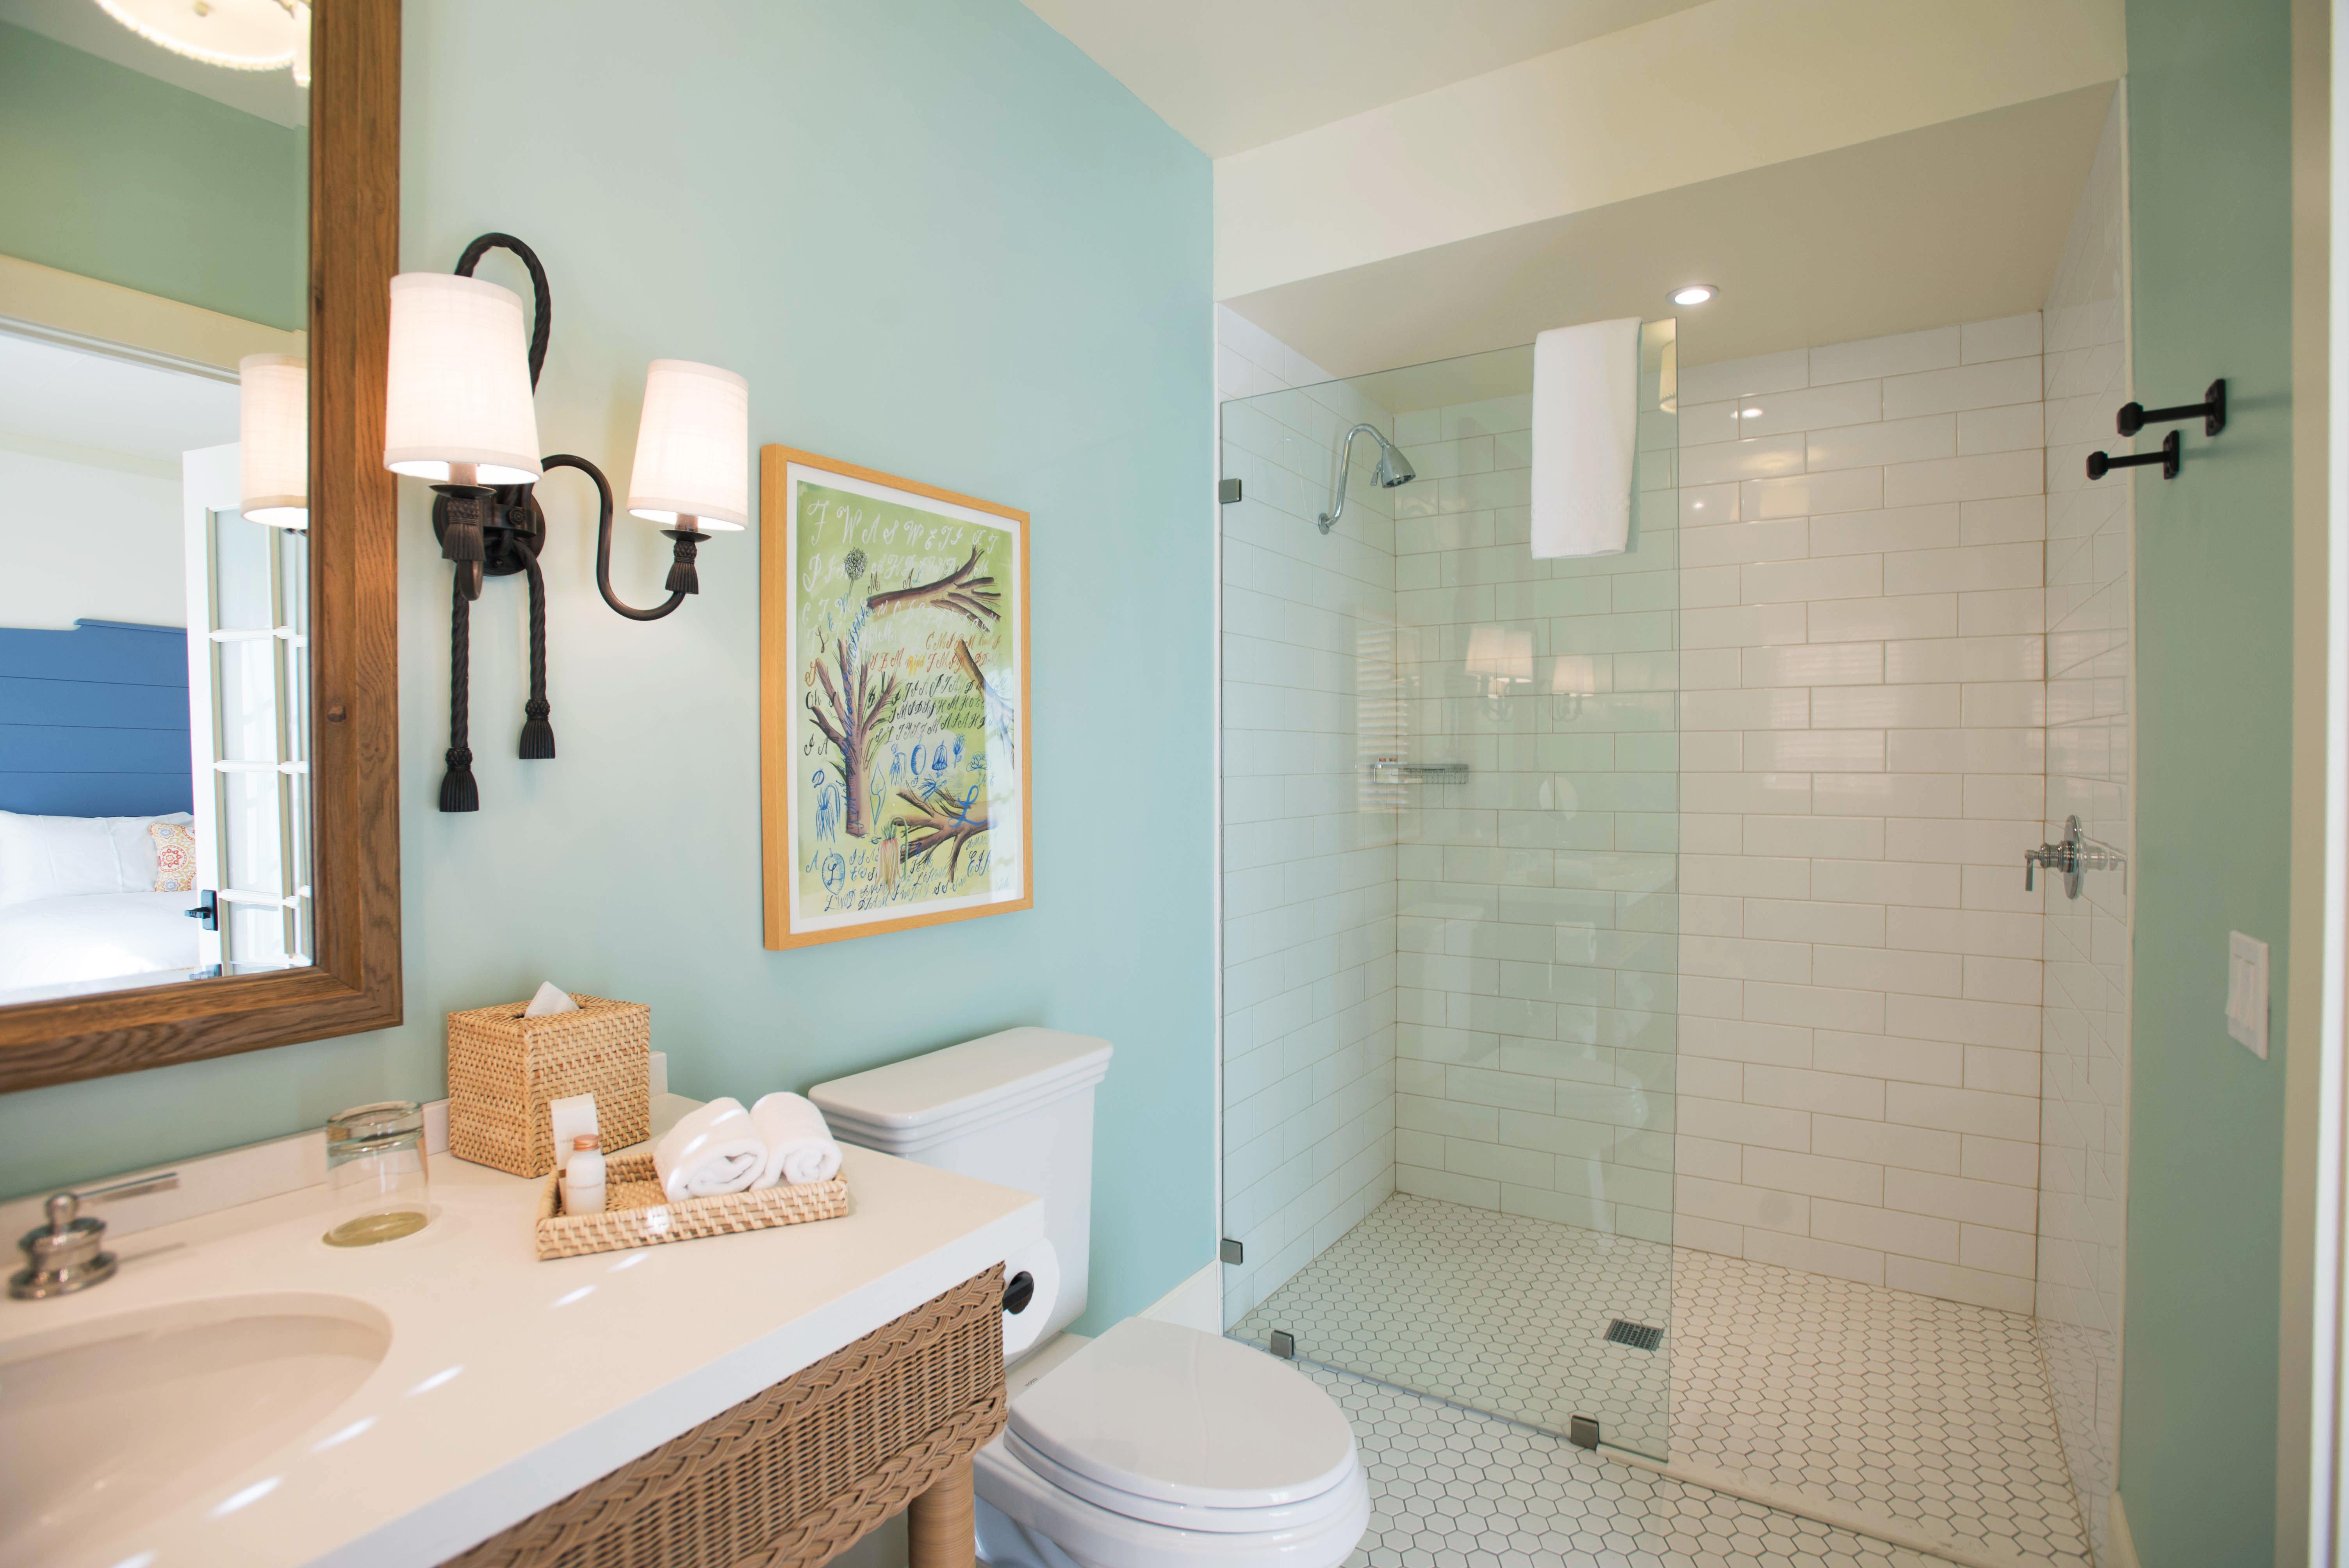 Bath Boutique Natural wonders Romance Wellness bathroom sink mirror property home toilet Suite plumbing fixture tub tile